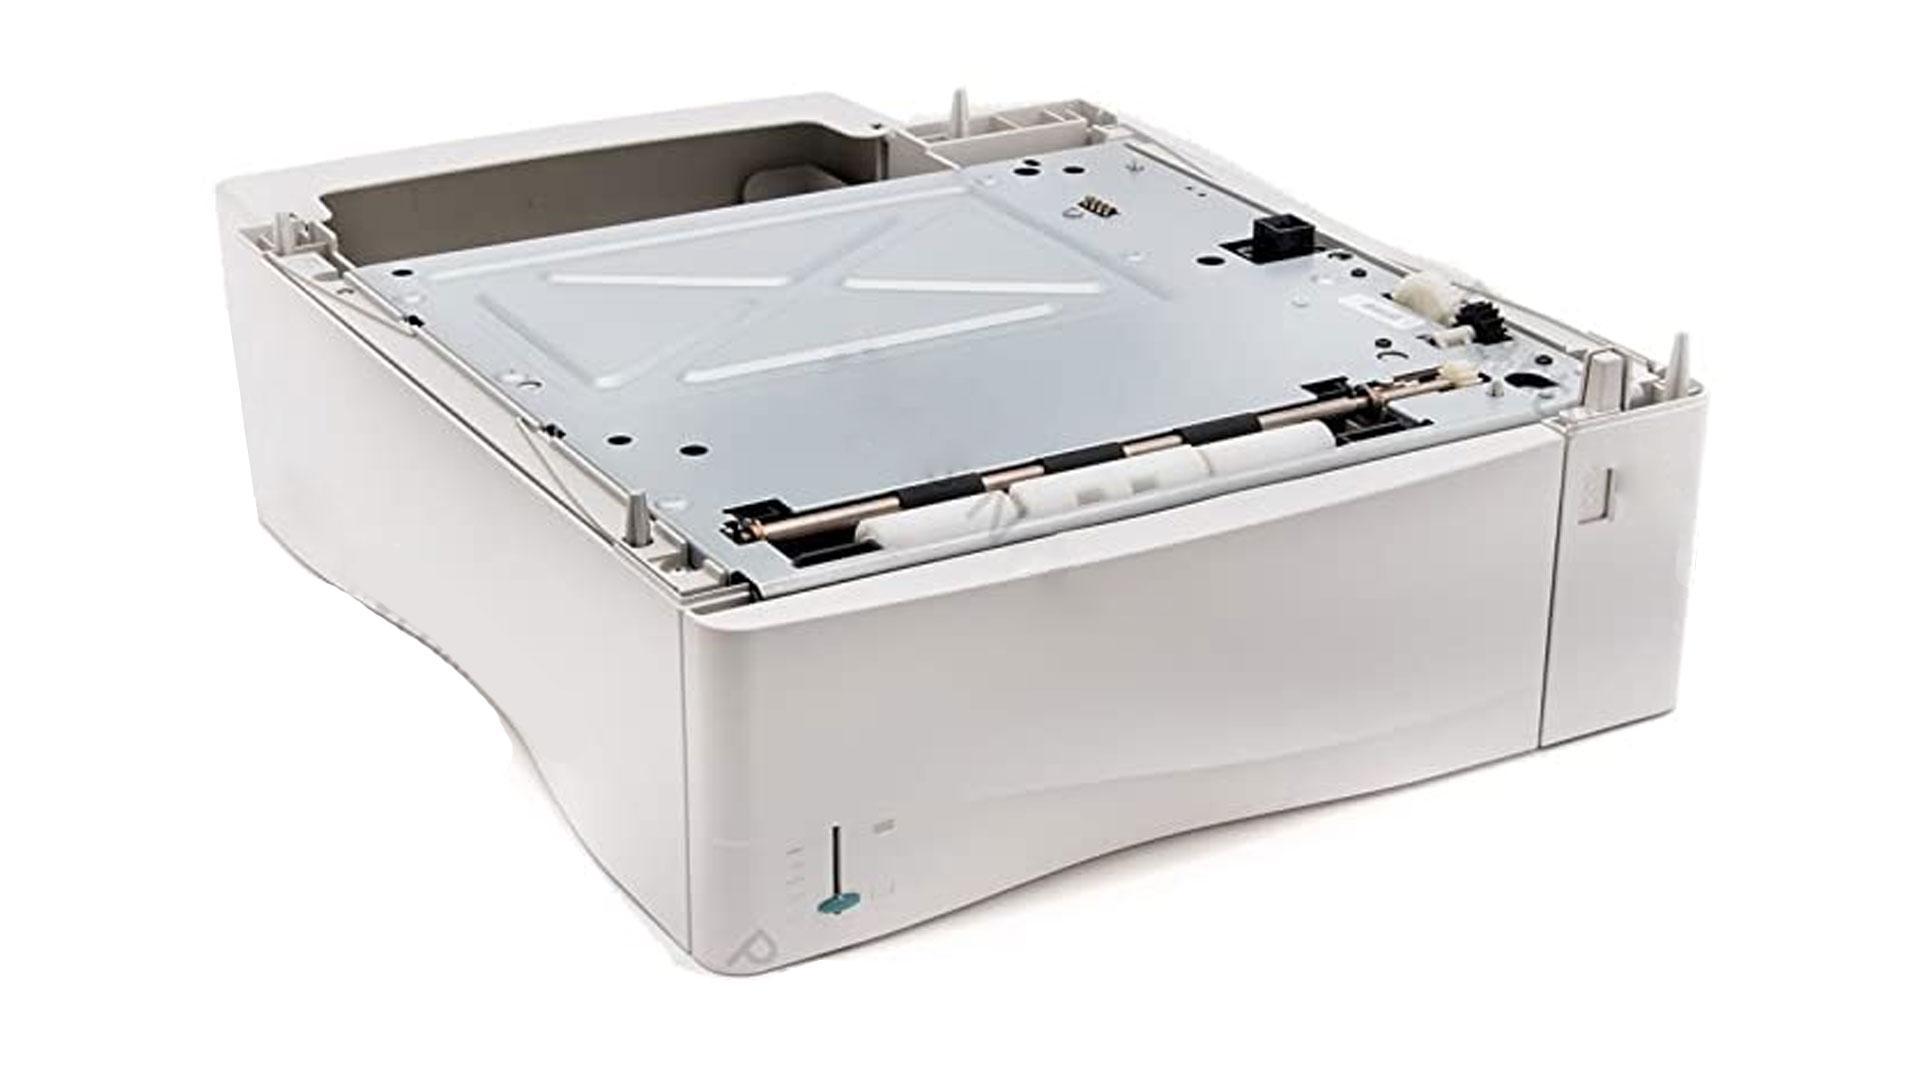 2X Chinch L+R 1x Audio Negro Celexon Panel de conexi/ón de Escritorio Expert TA-200B Corriente 193x150mm HDMI CAT6 VGA